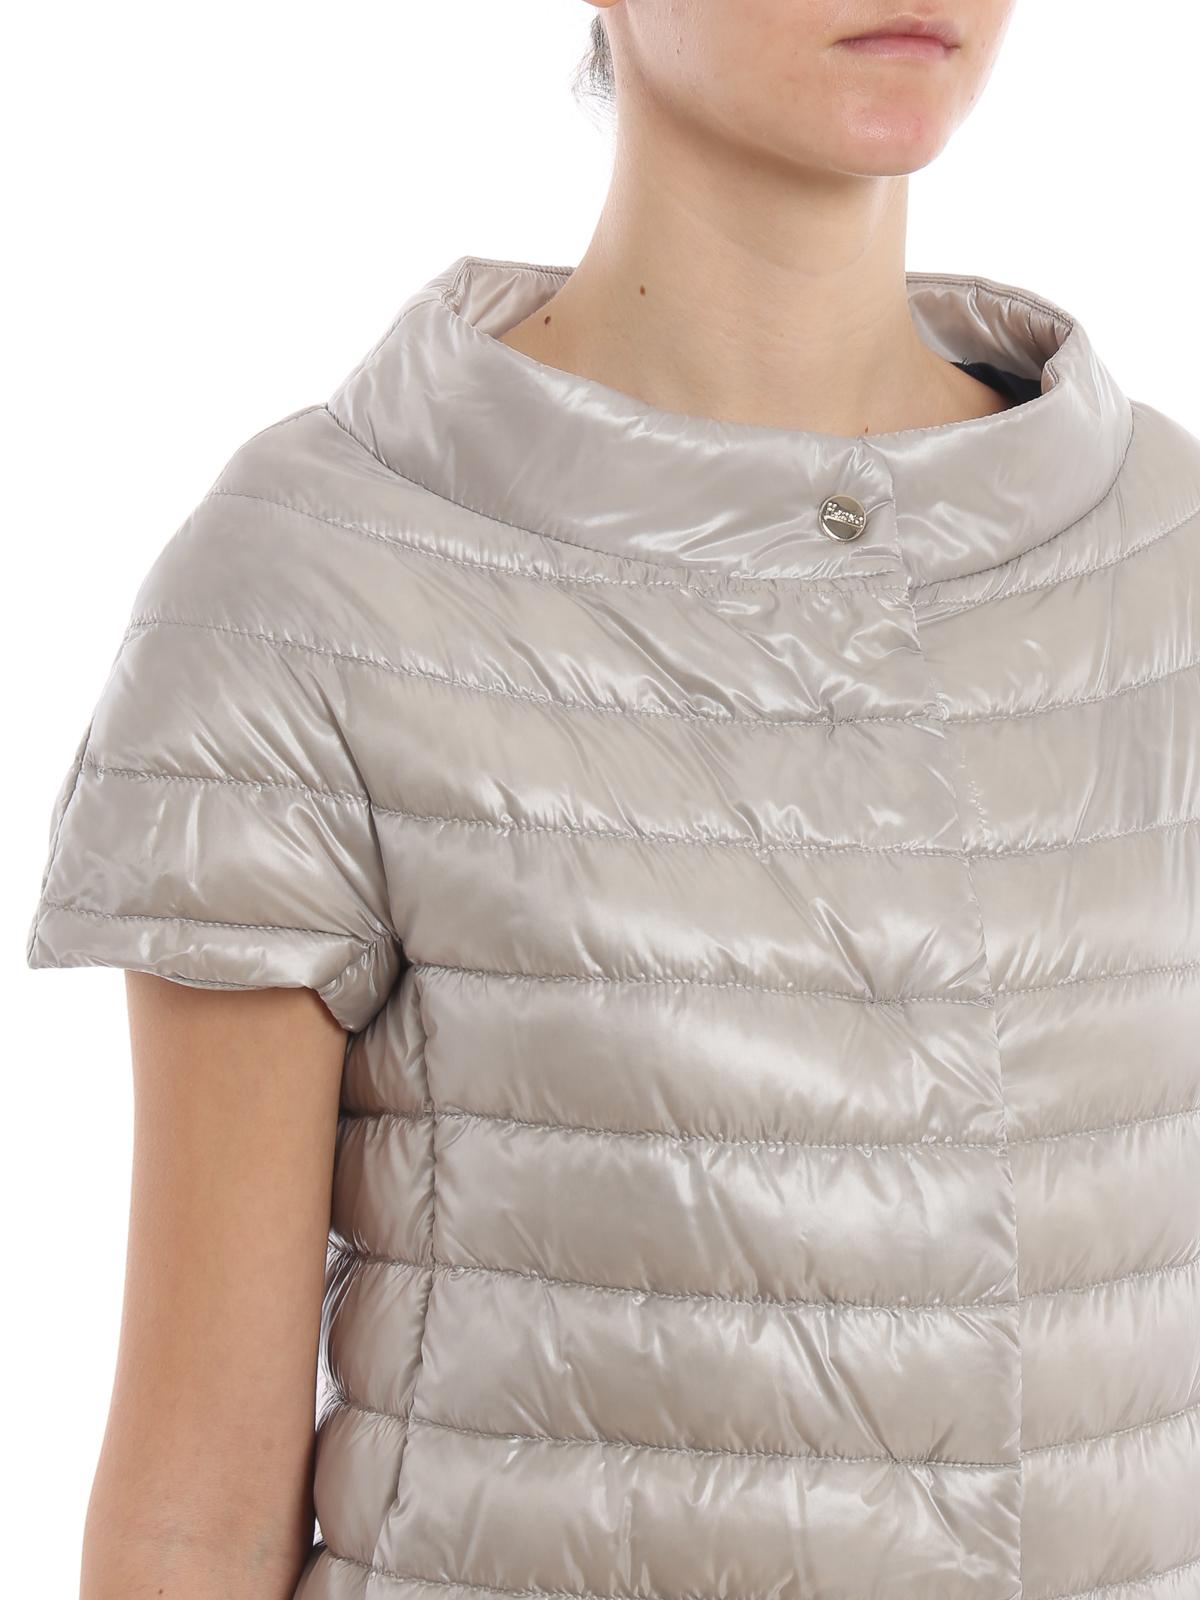 innovative design 2f8c1 6ac59 Herno - Piumino Greta grigio perla - giacche imbottite ...